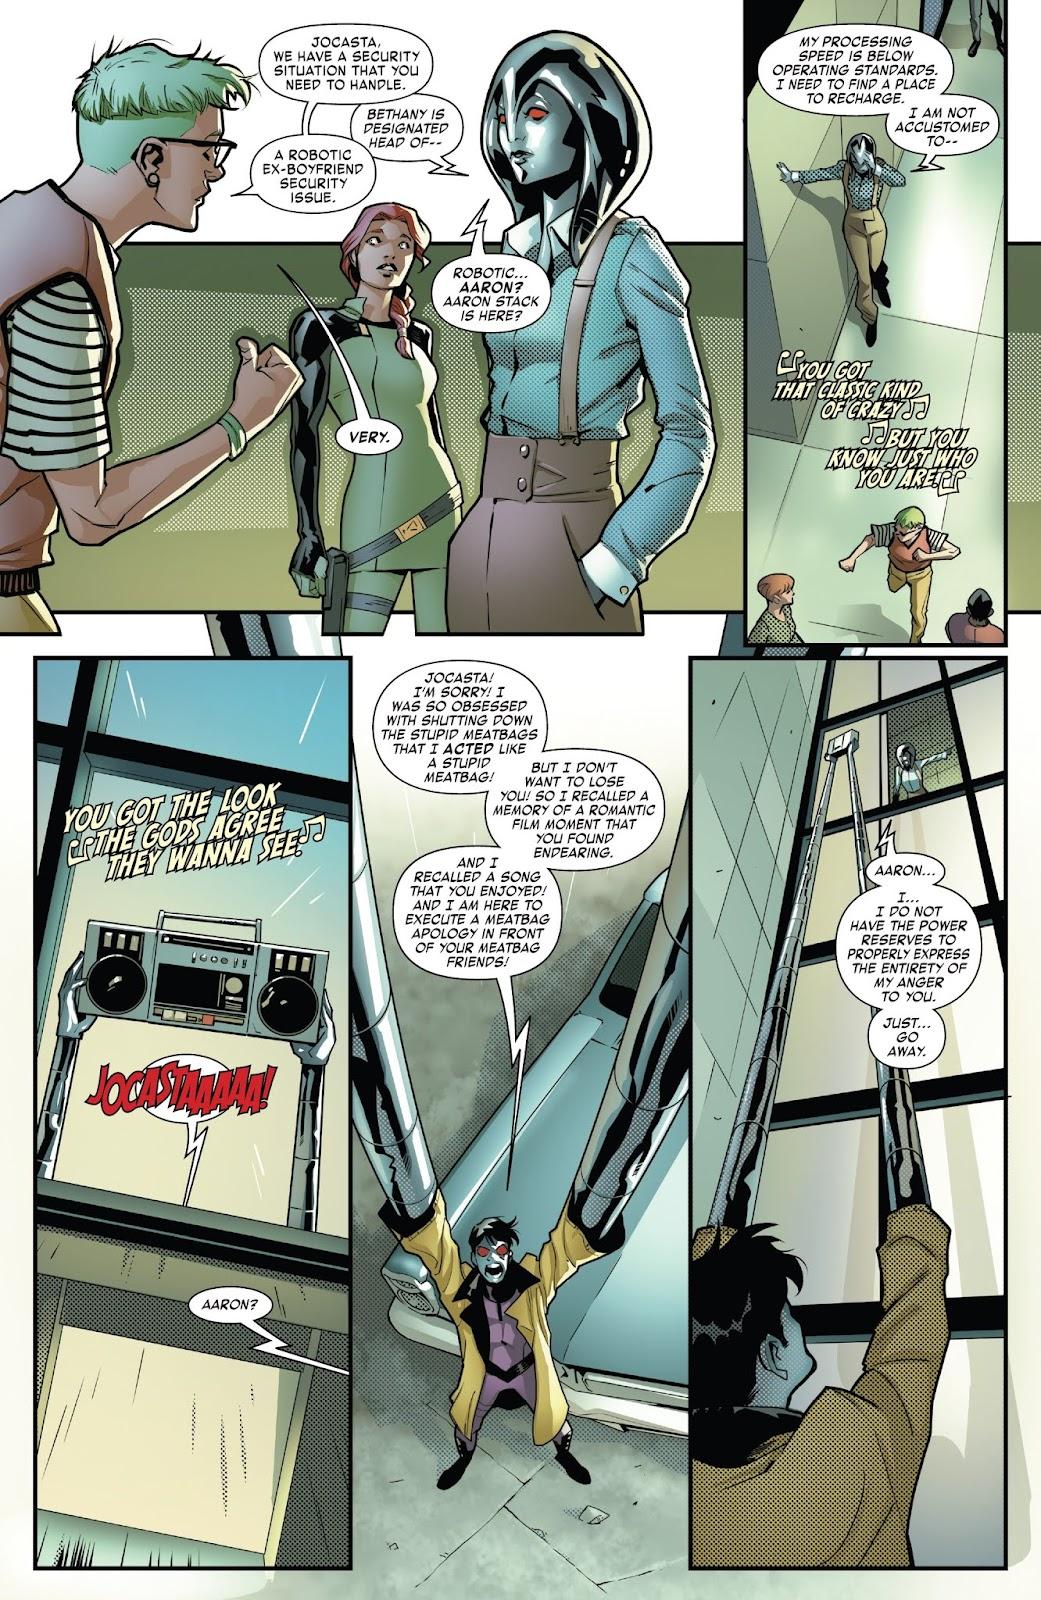 Read online Tony Stark: Iron Man comic -  Issue #6 - 15